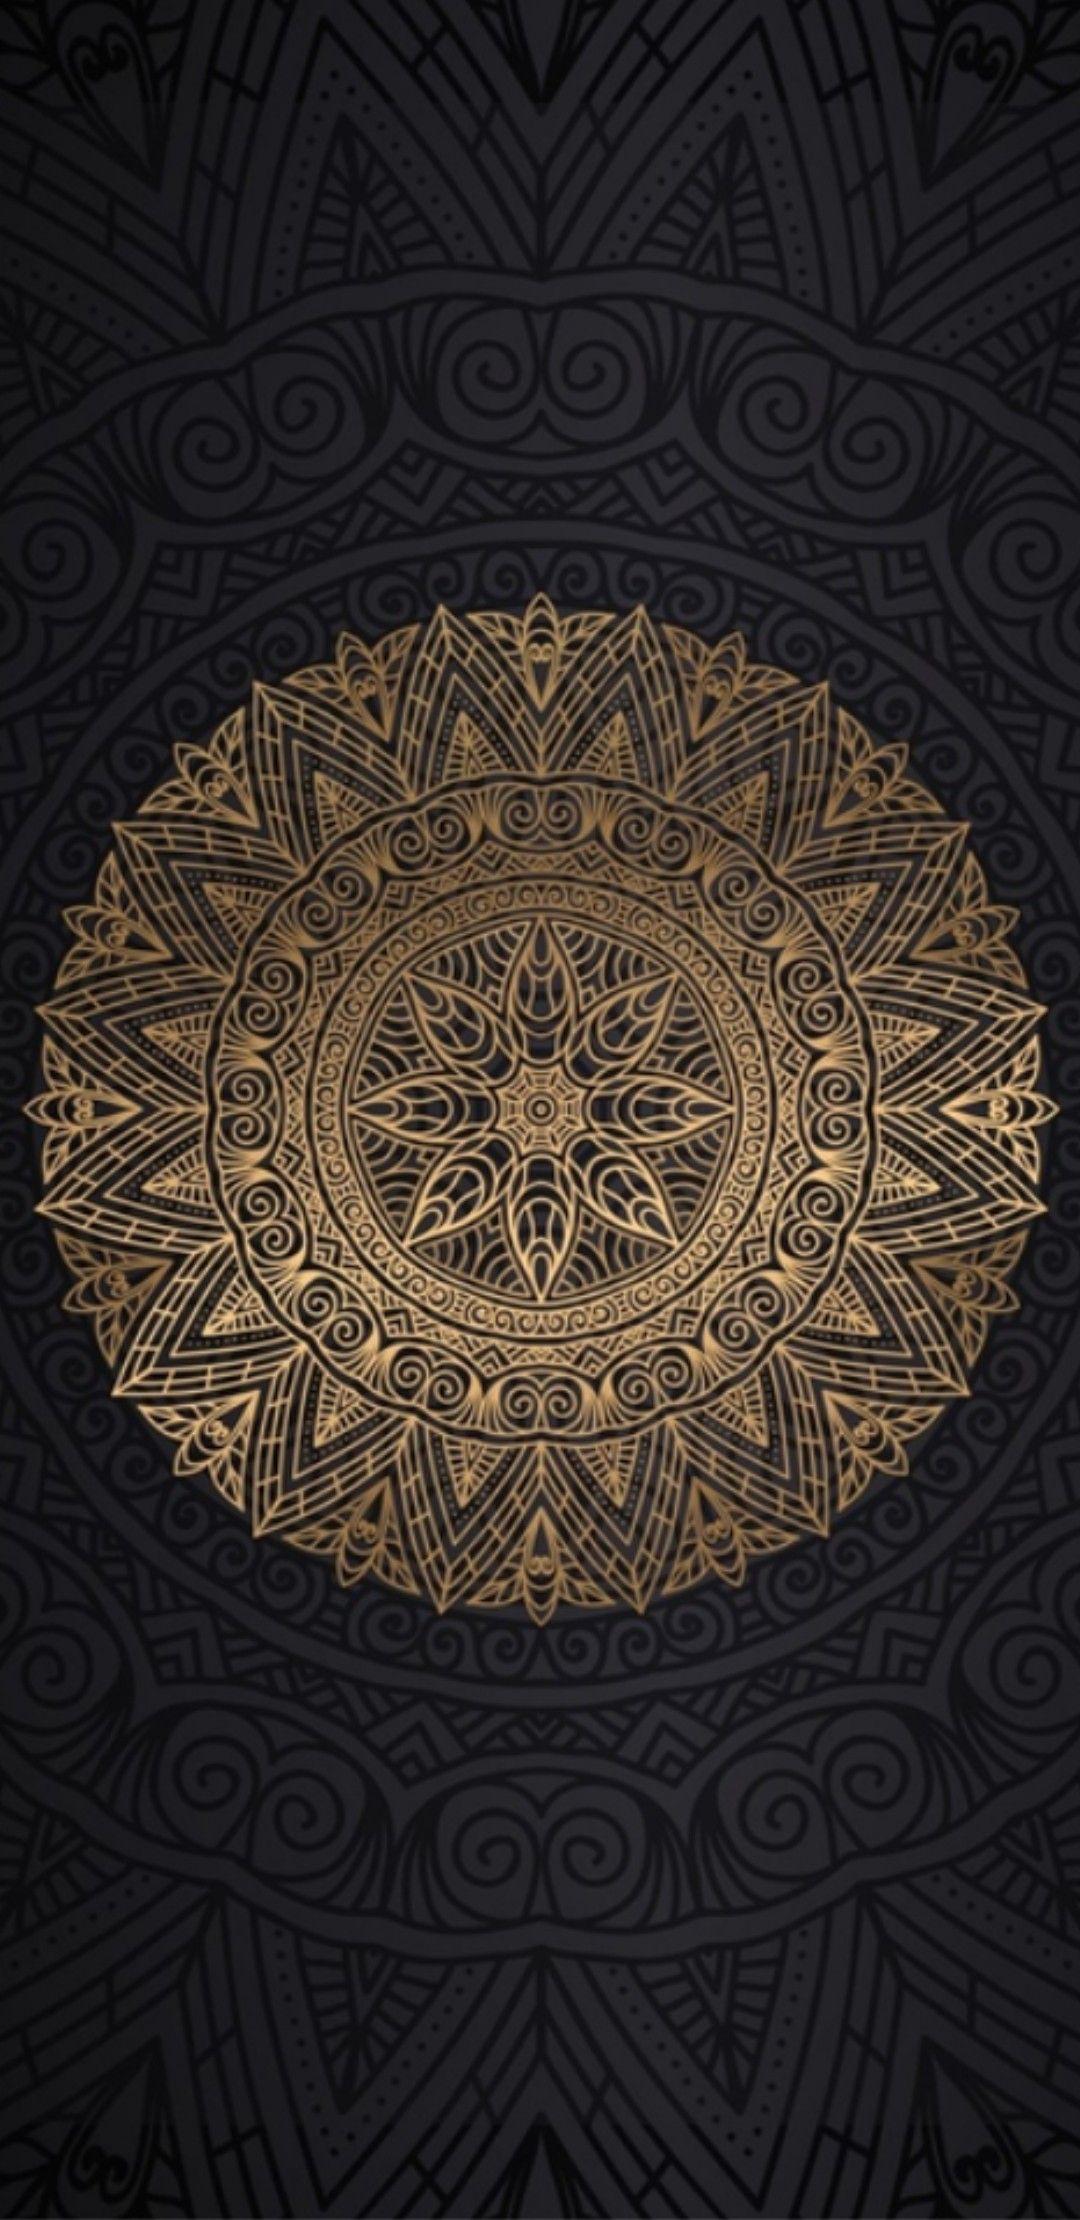 Mandala Mandala Wallpaper Mandala Background Wallpapers Graphic Wallpaper